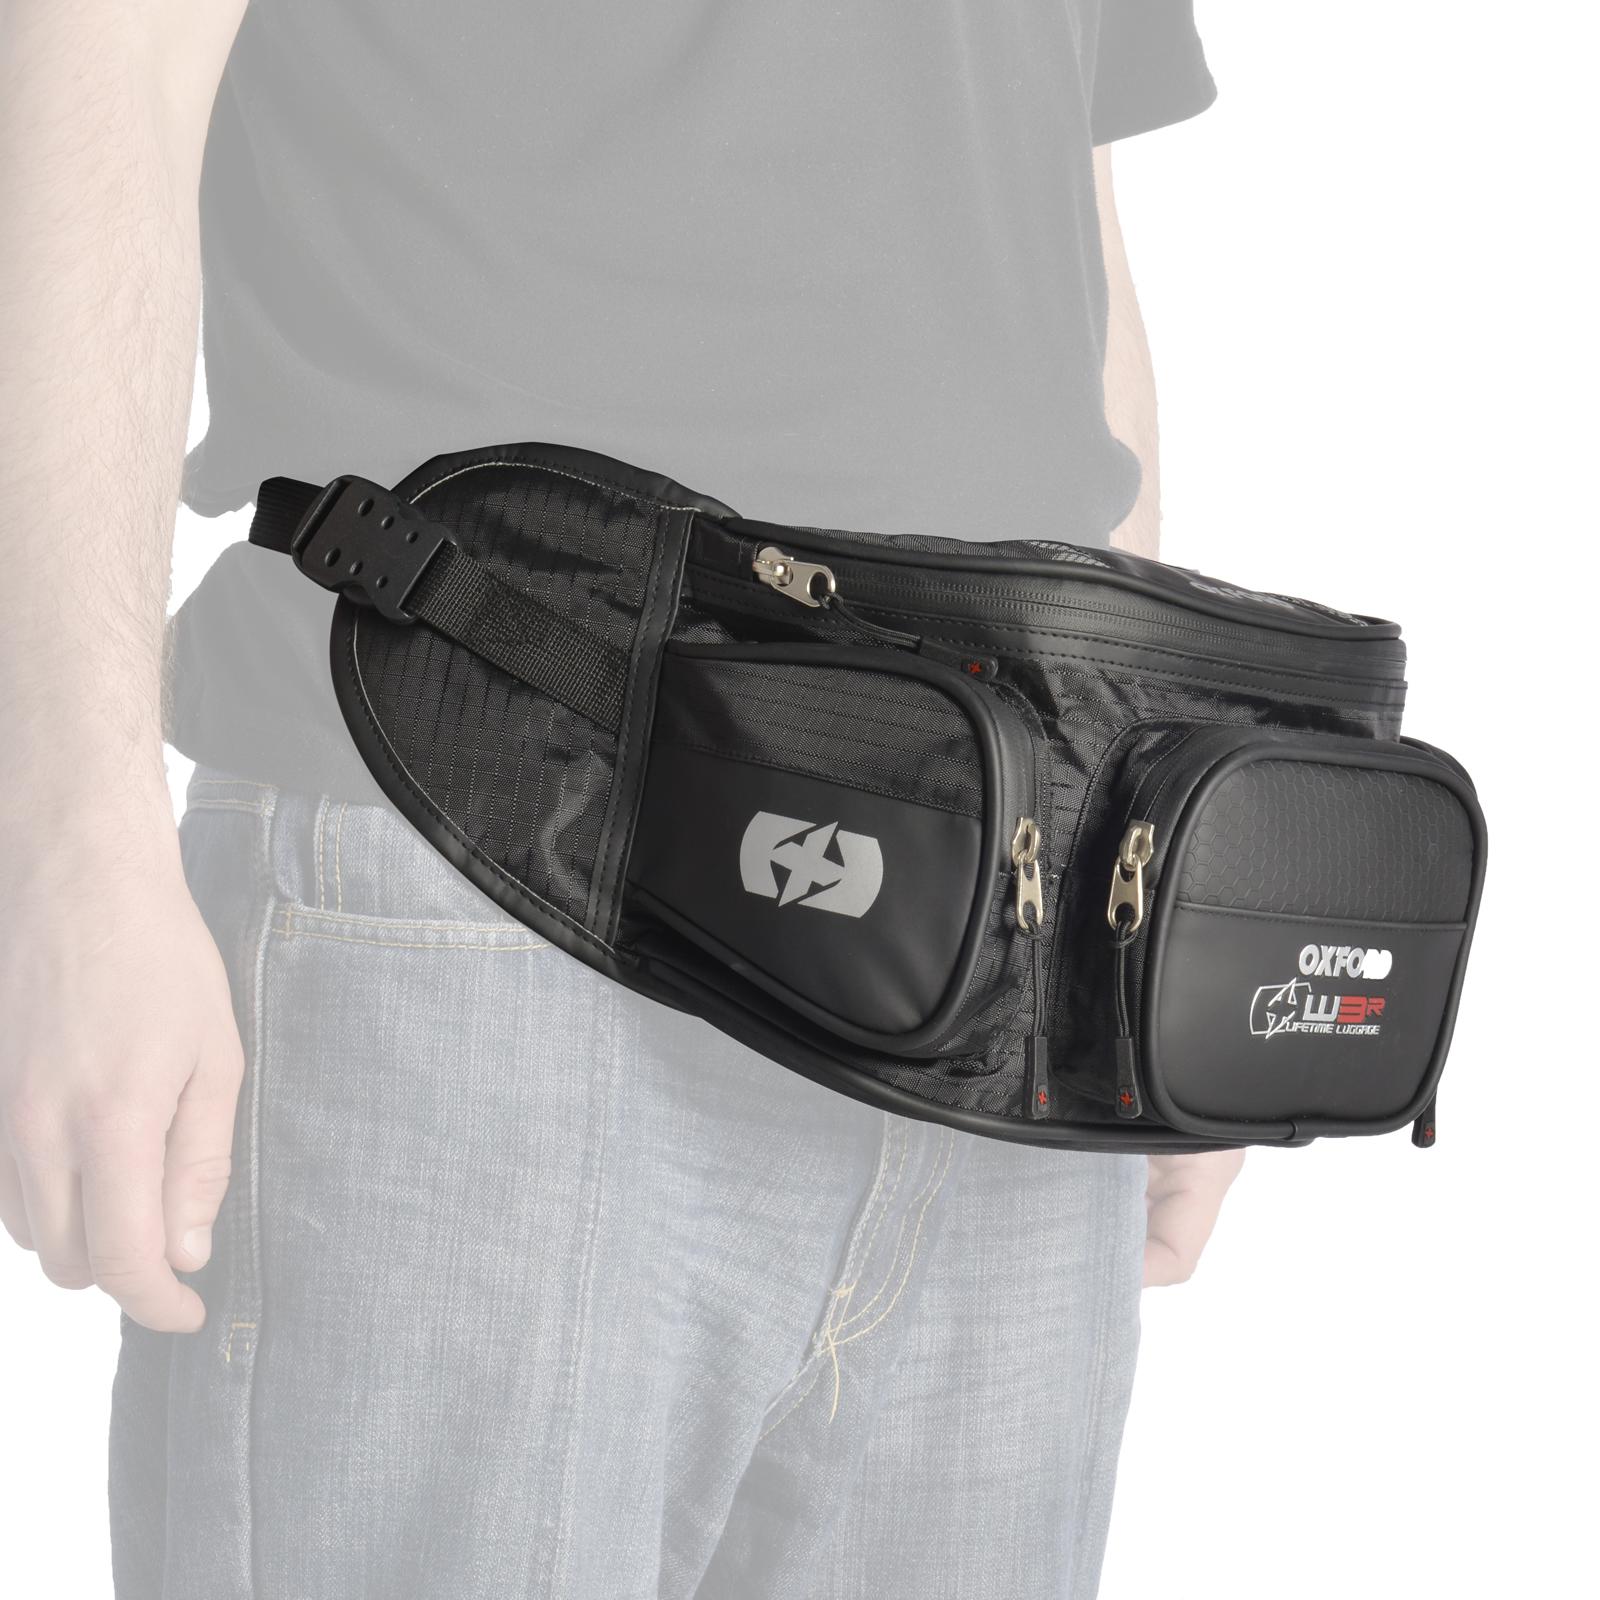 Motorcycle Oxford XW3R Waist Bag 3L Bike Riding Visor Accessories Pouch Black